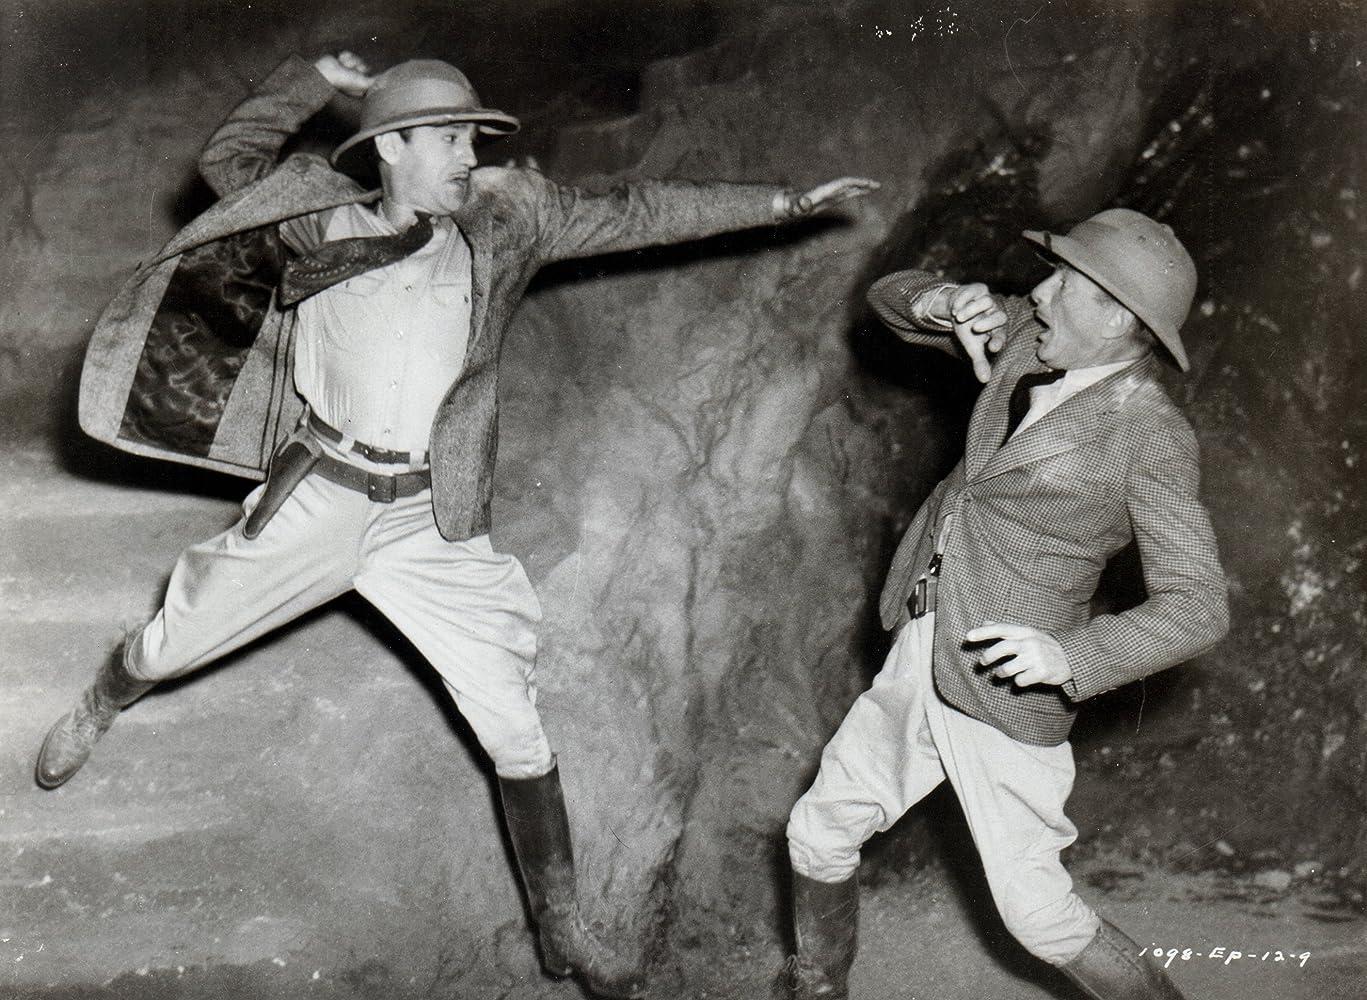 Robert Strange and Harry Worth in Adventures of Captain Marvel (1941)